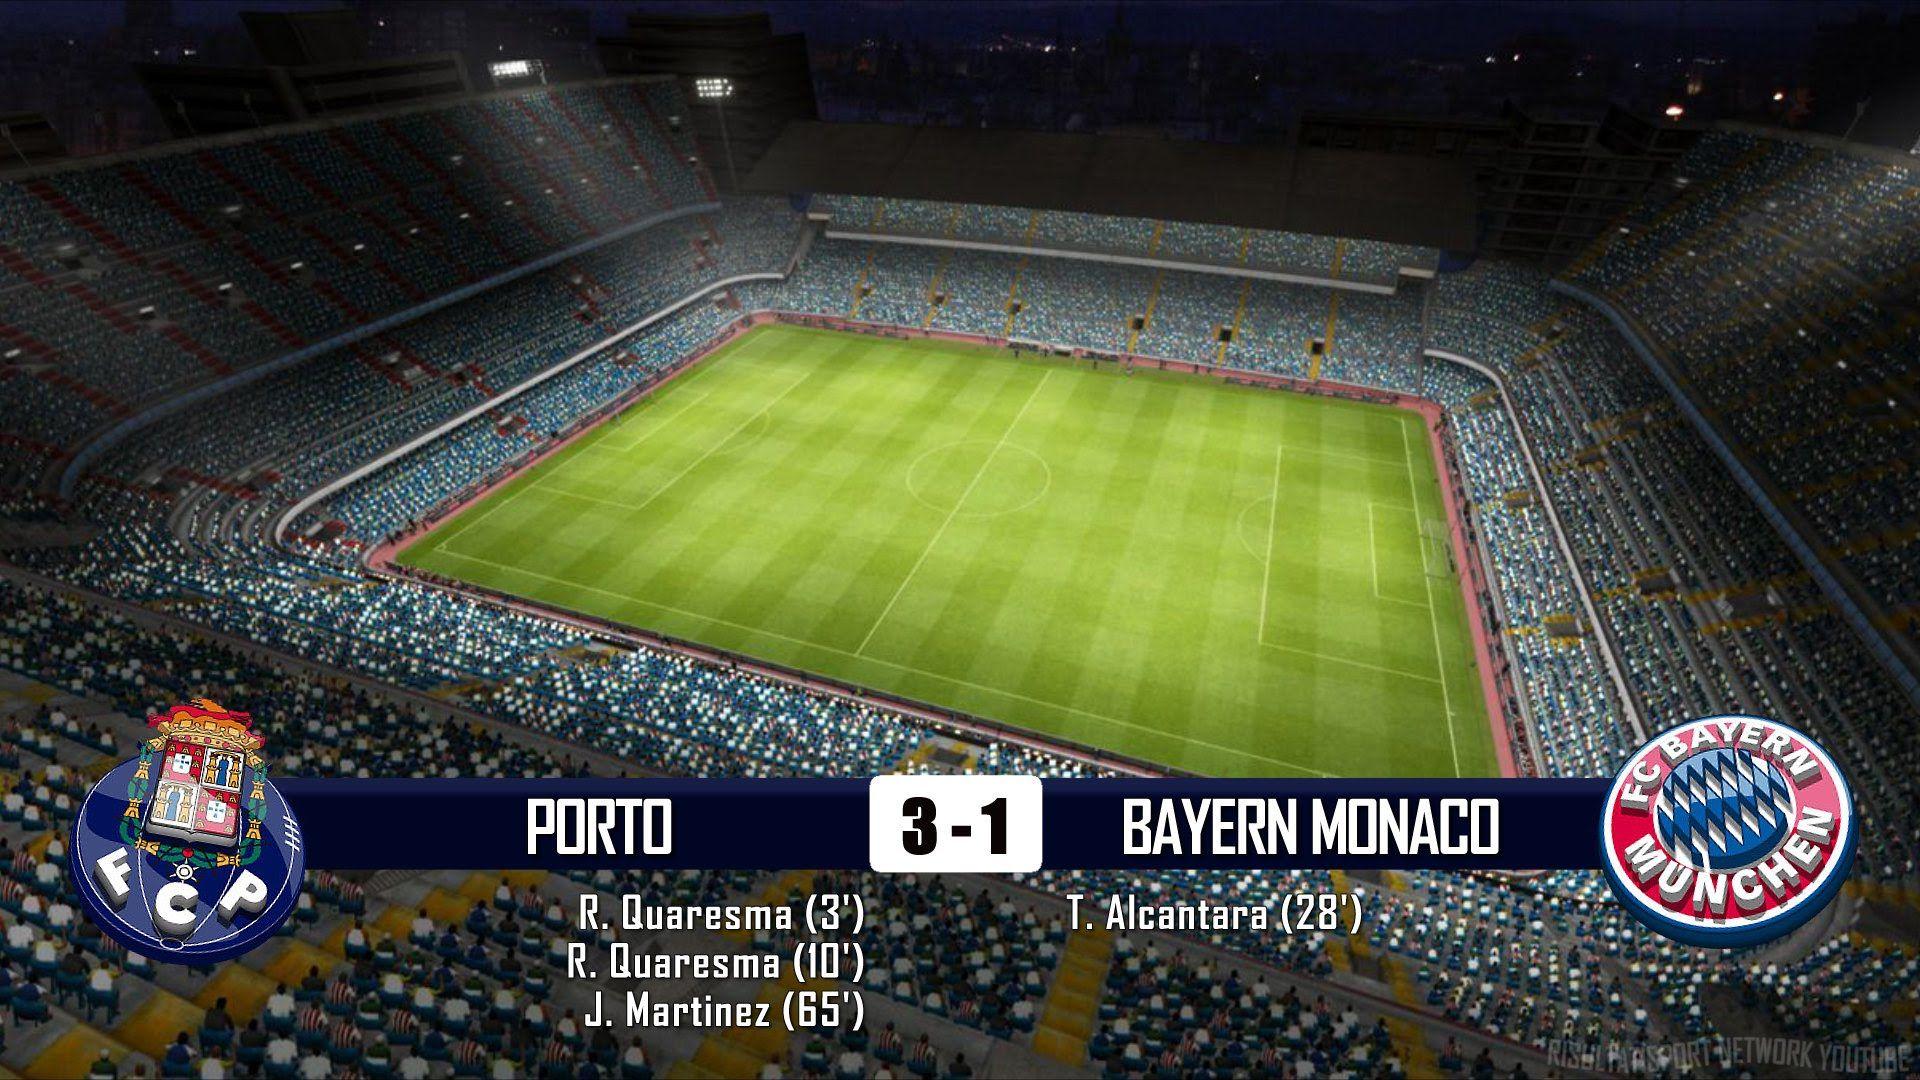 Bayern Monaco - Porto